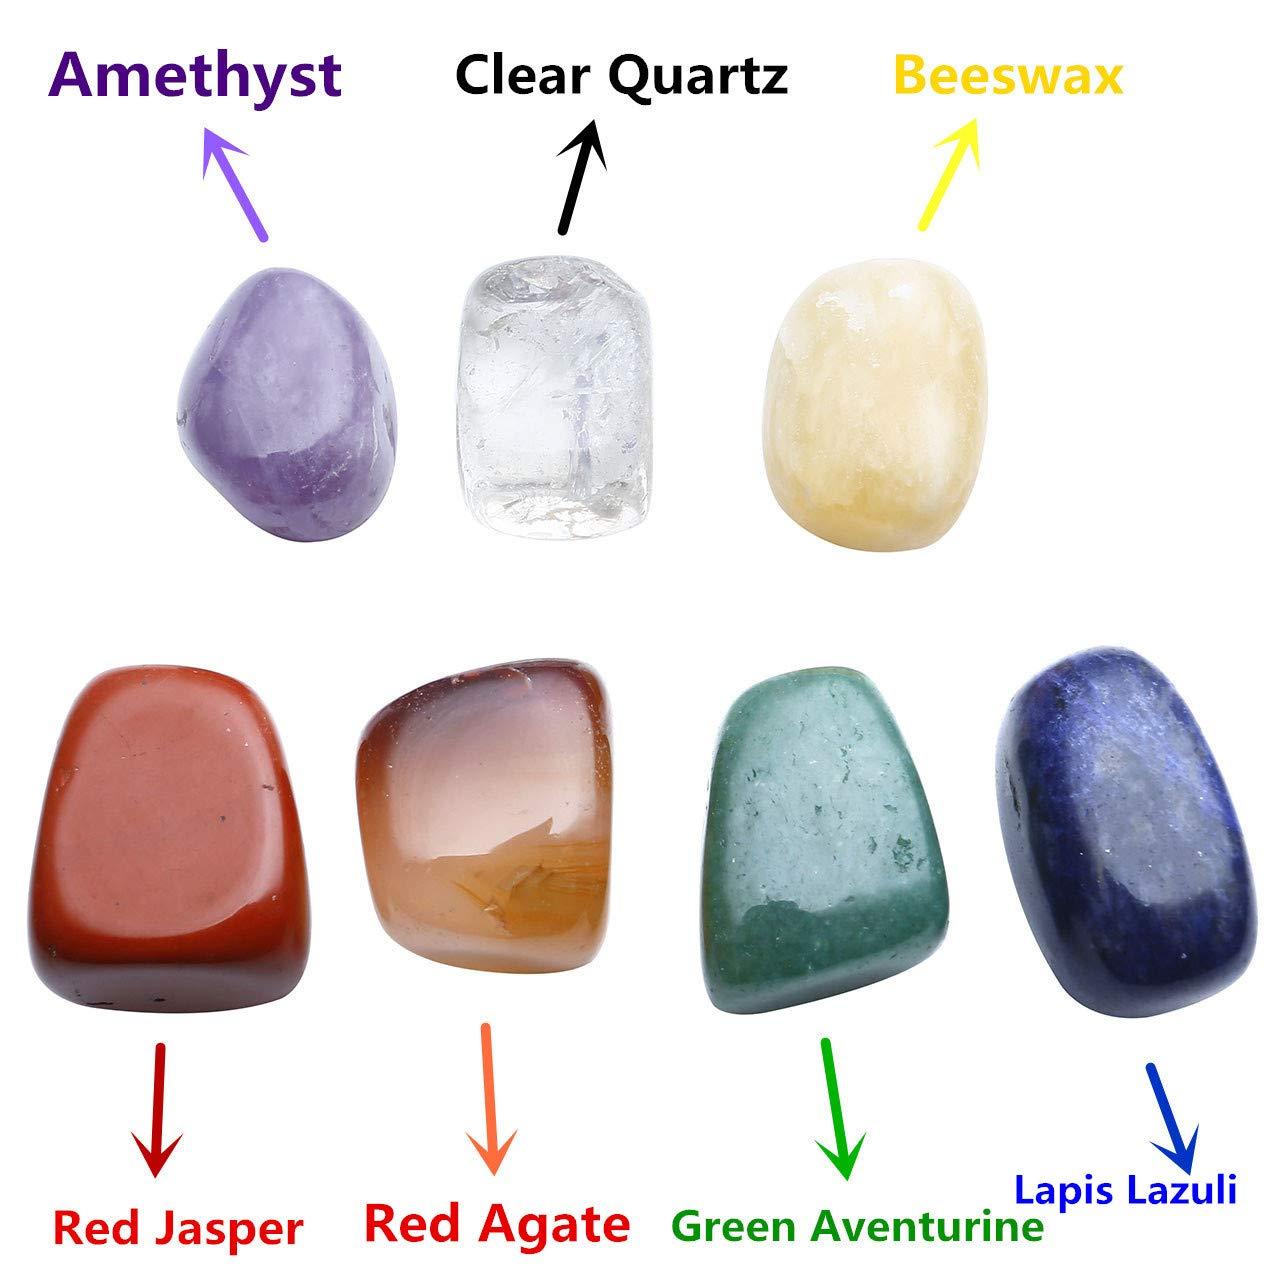 Top Plaza 7 Chakra Reiki Healing Crystals Yoga Balance Irregular Shape Polished Tumbled Palm Stones W/ 7 Chakra Healing Crystal Bracelet (7 Chakra Bracelet Without Charm) by Top Plaza (Image #4)